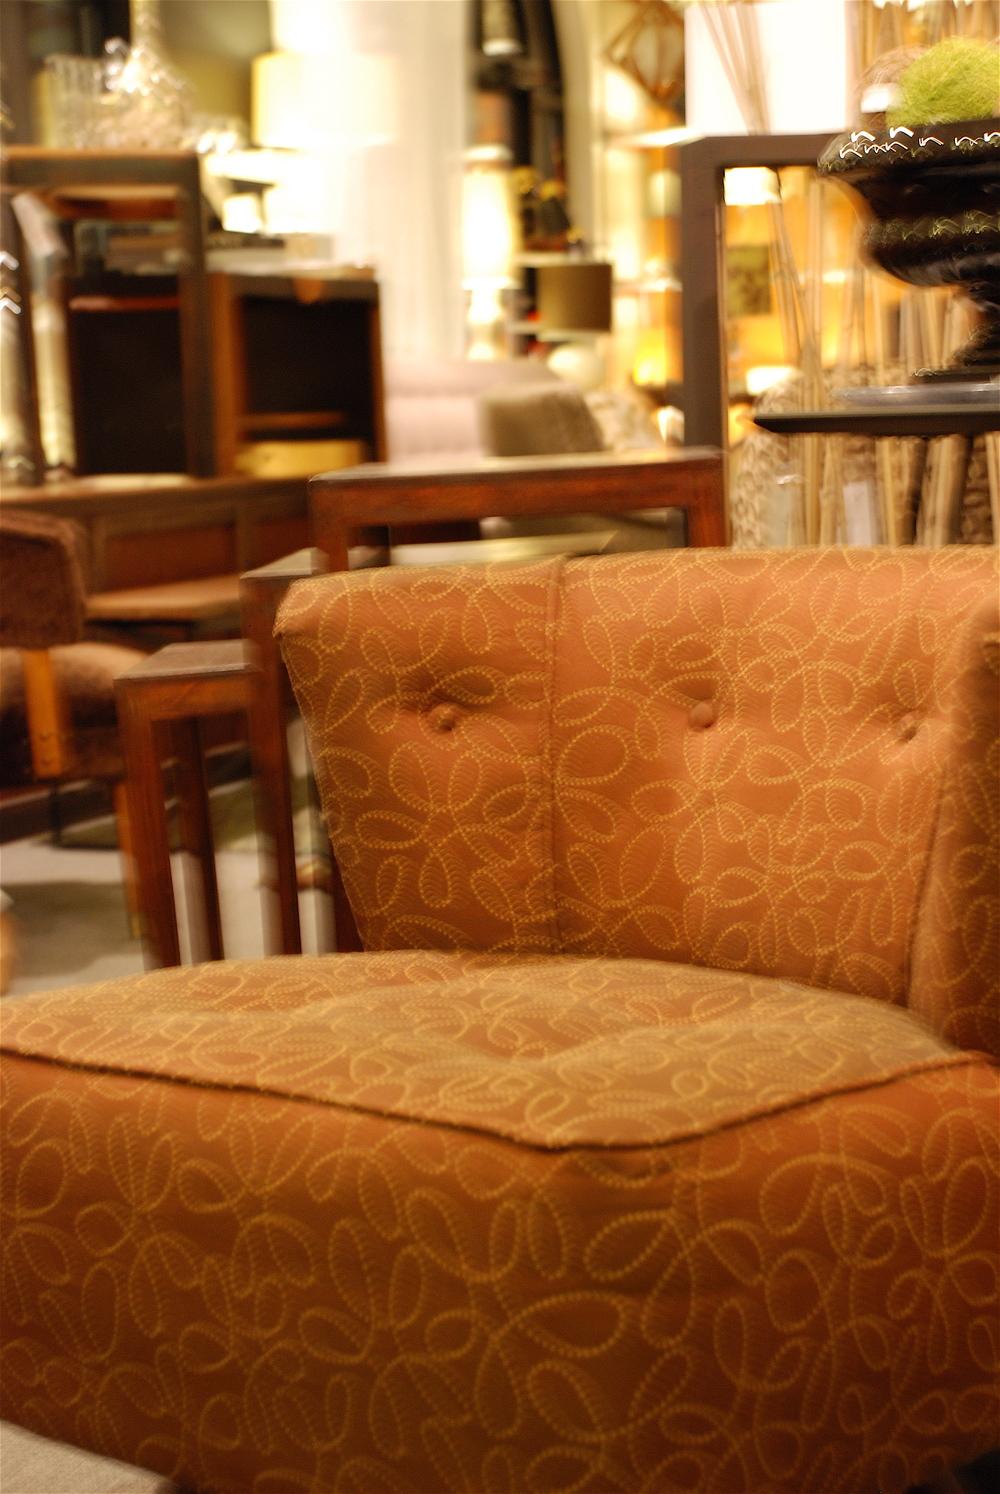 Brown Slipper Chair.jpg